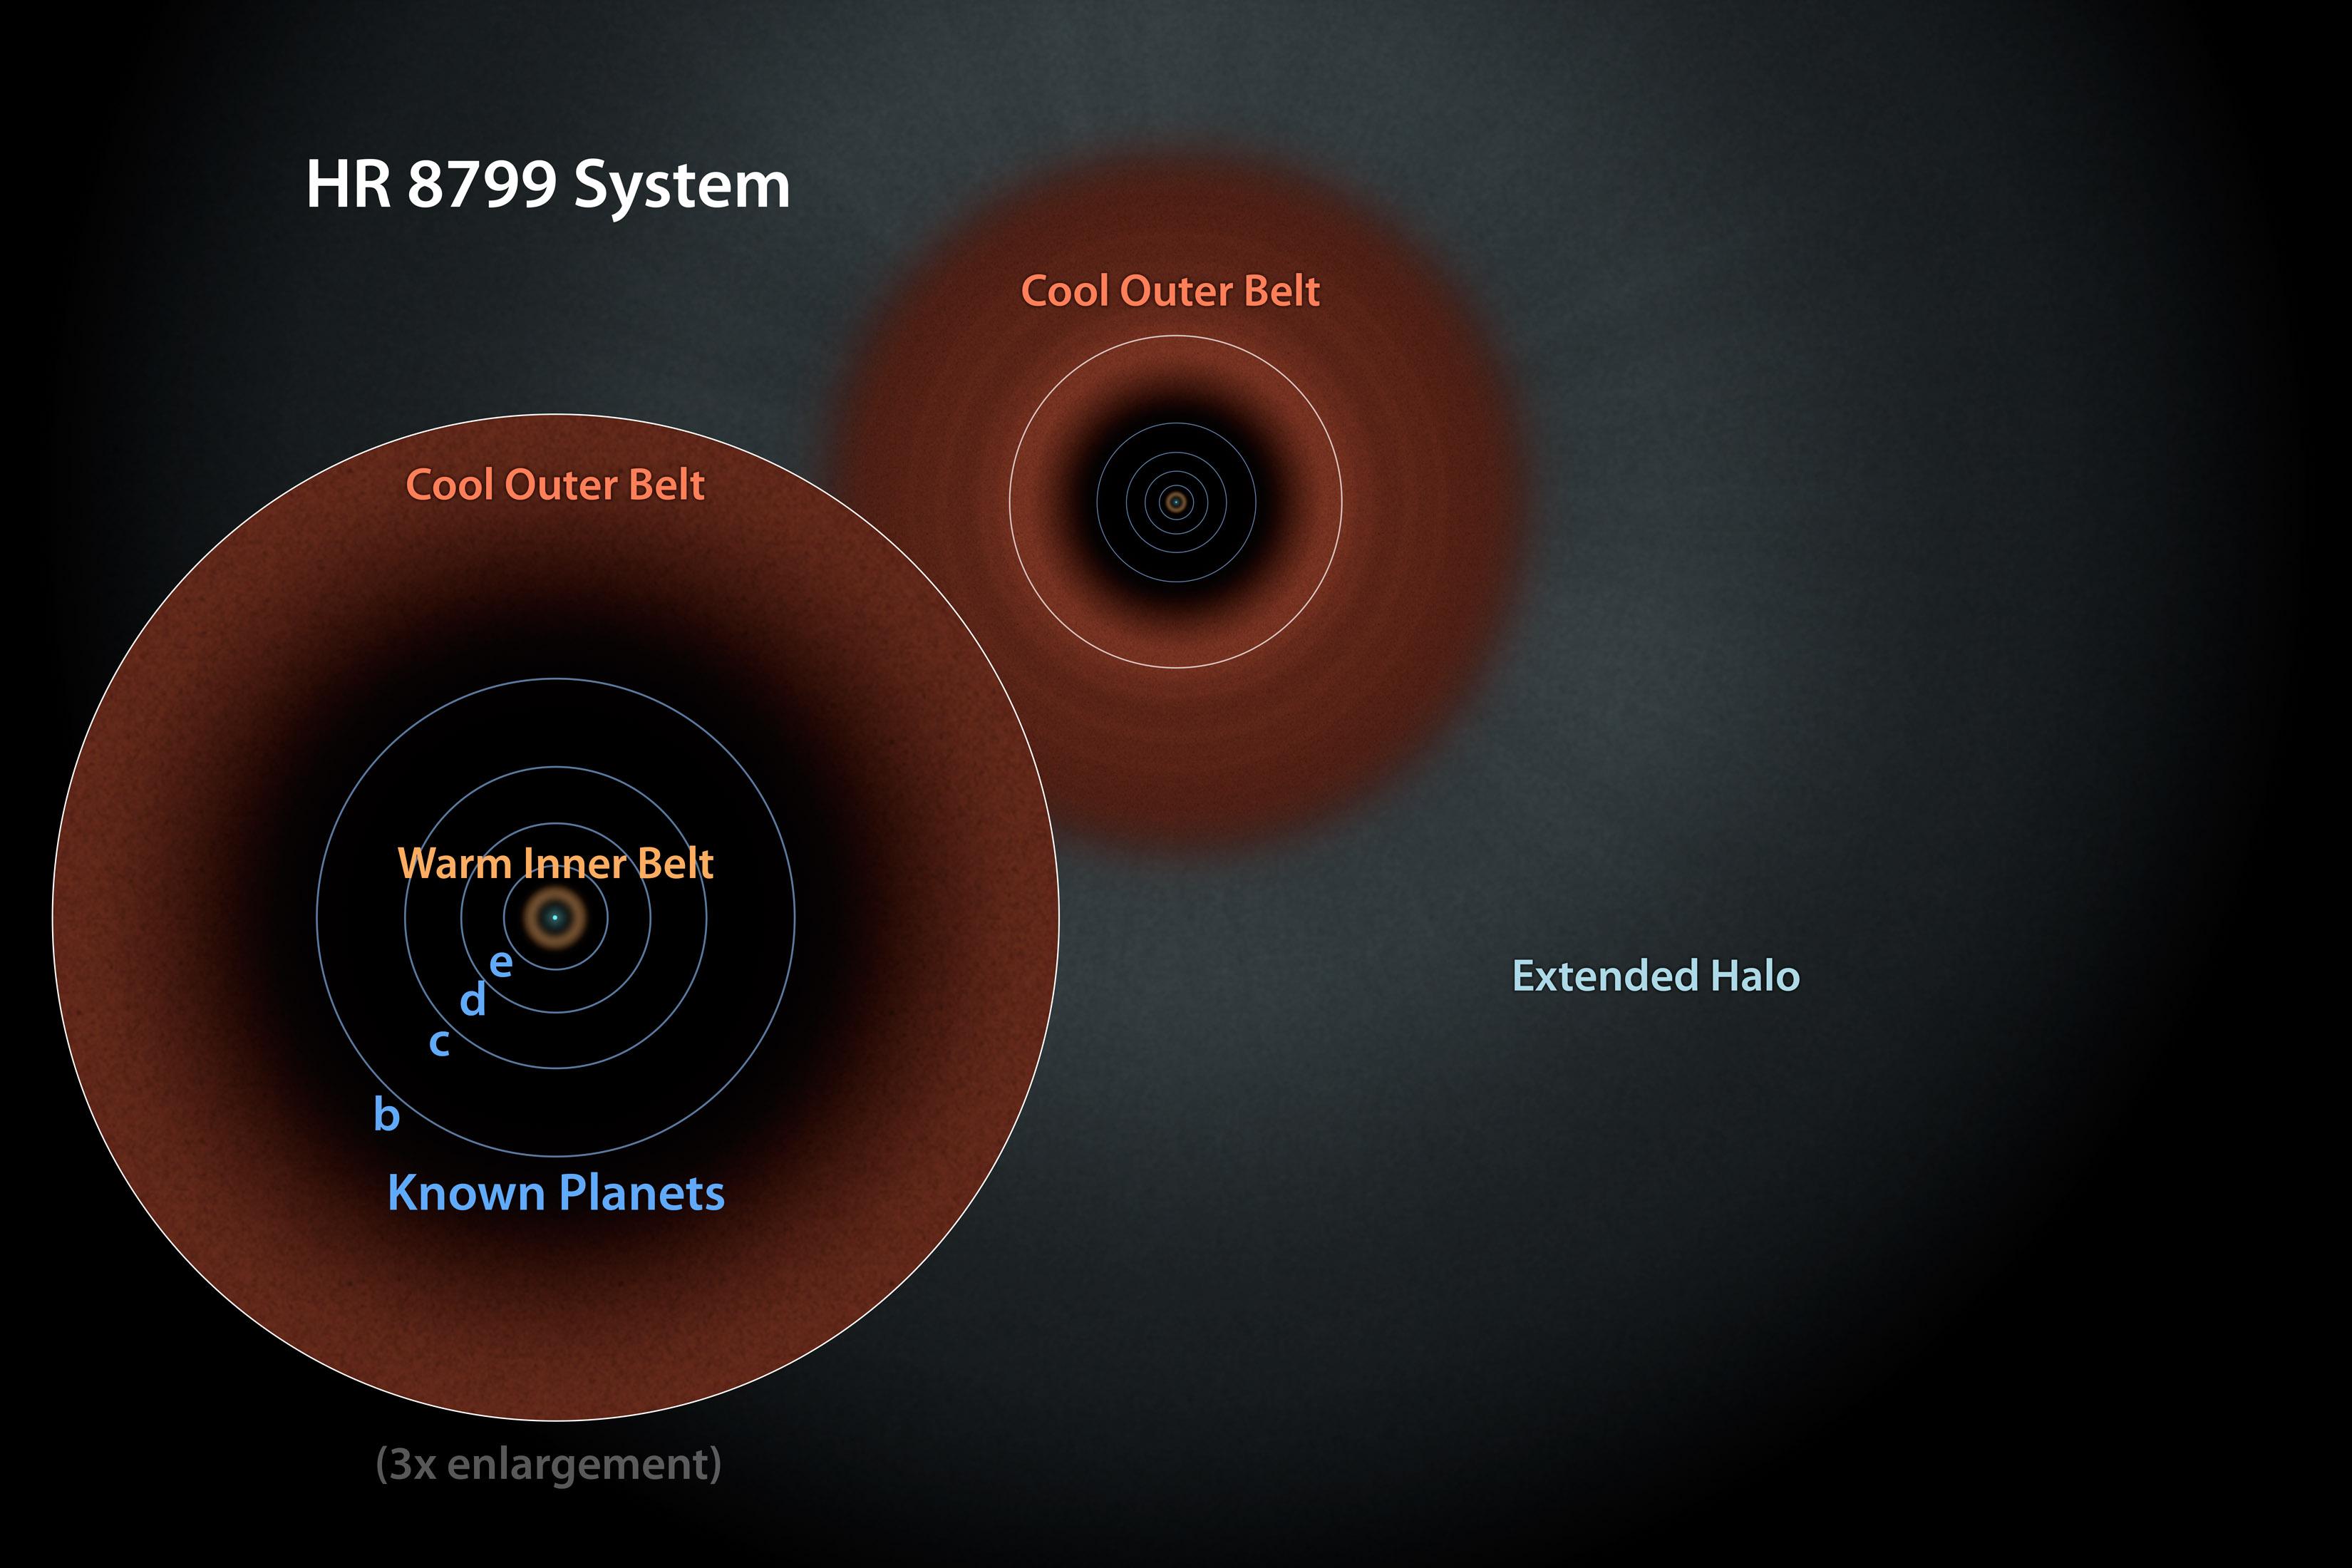 Система HR 8799. Ілюстрація: NASA/JPL-Caltech